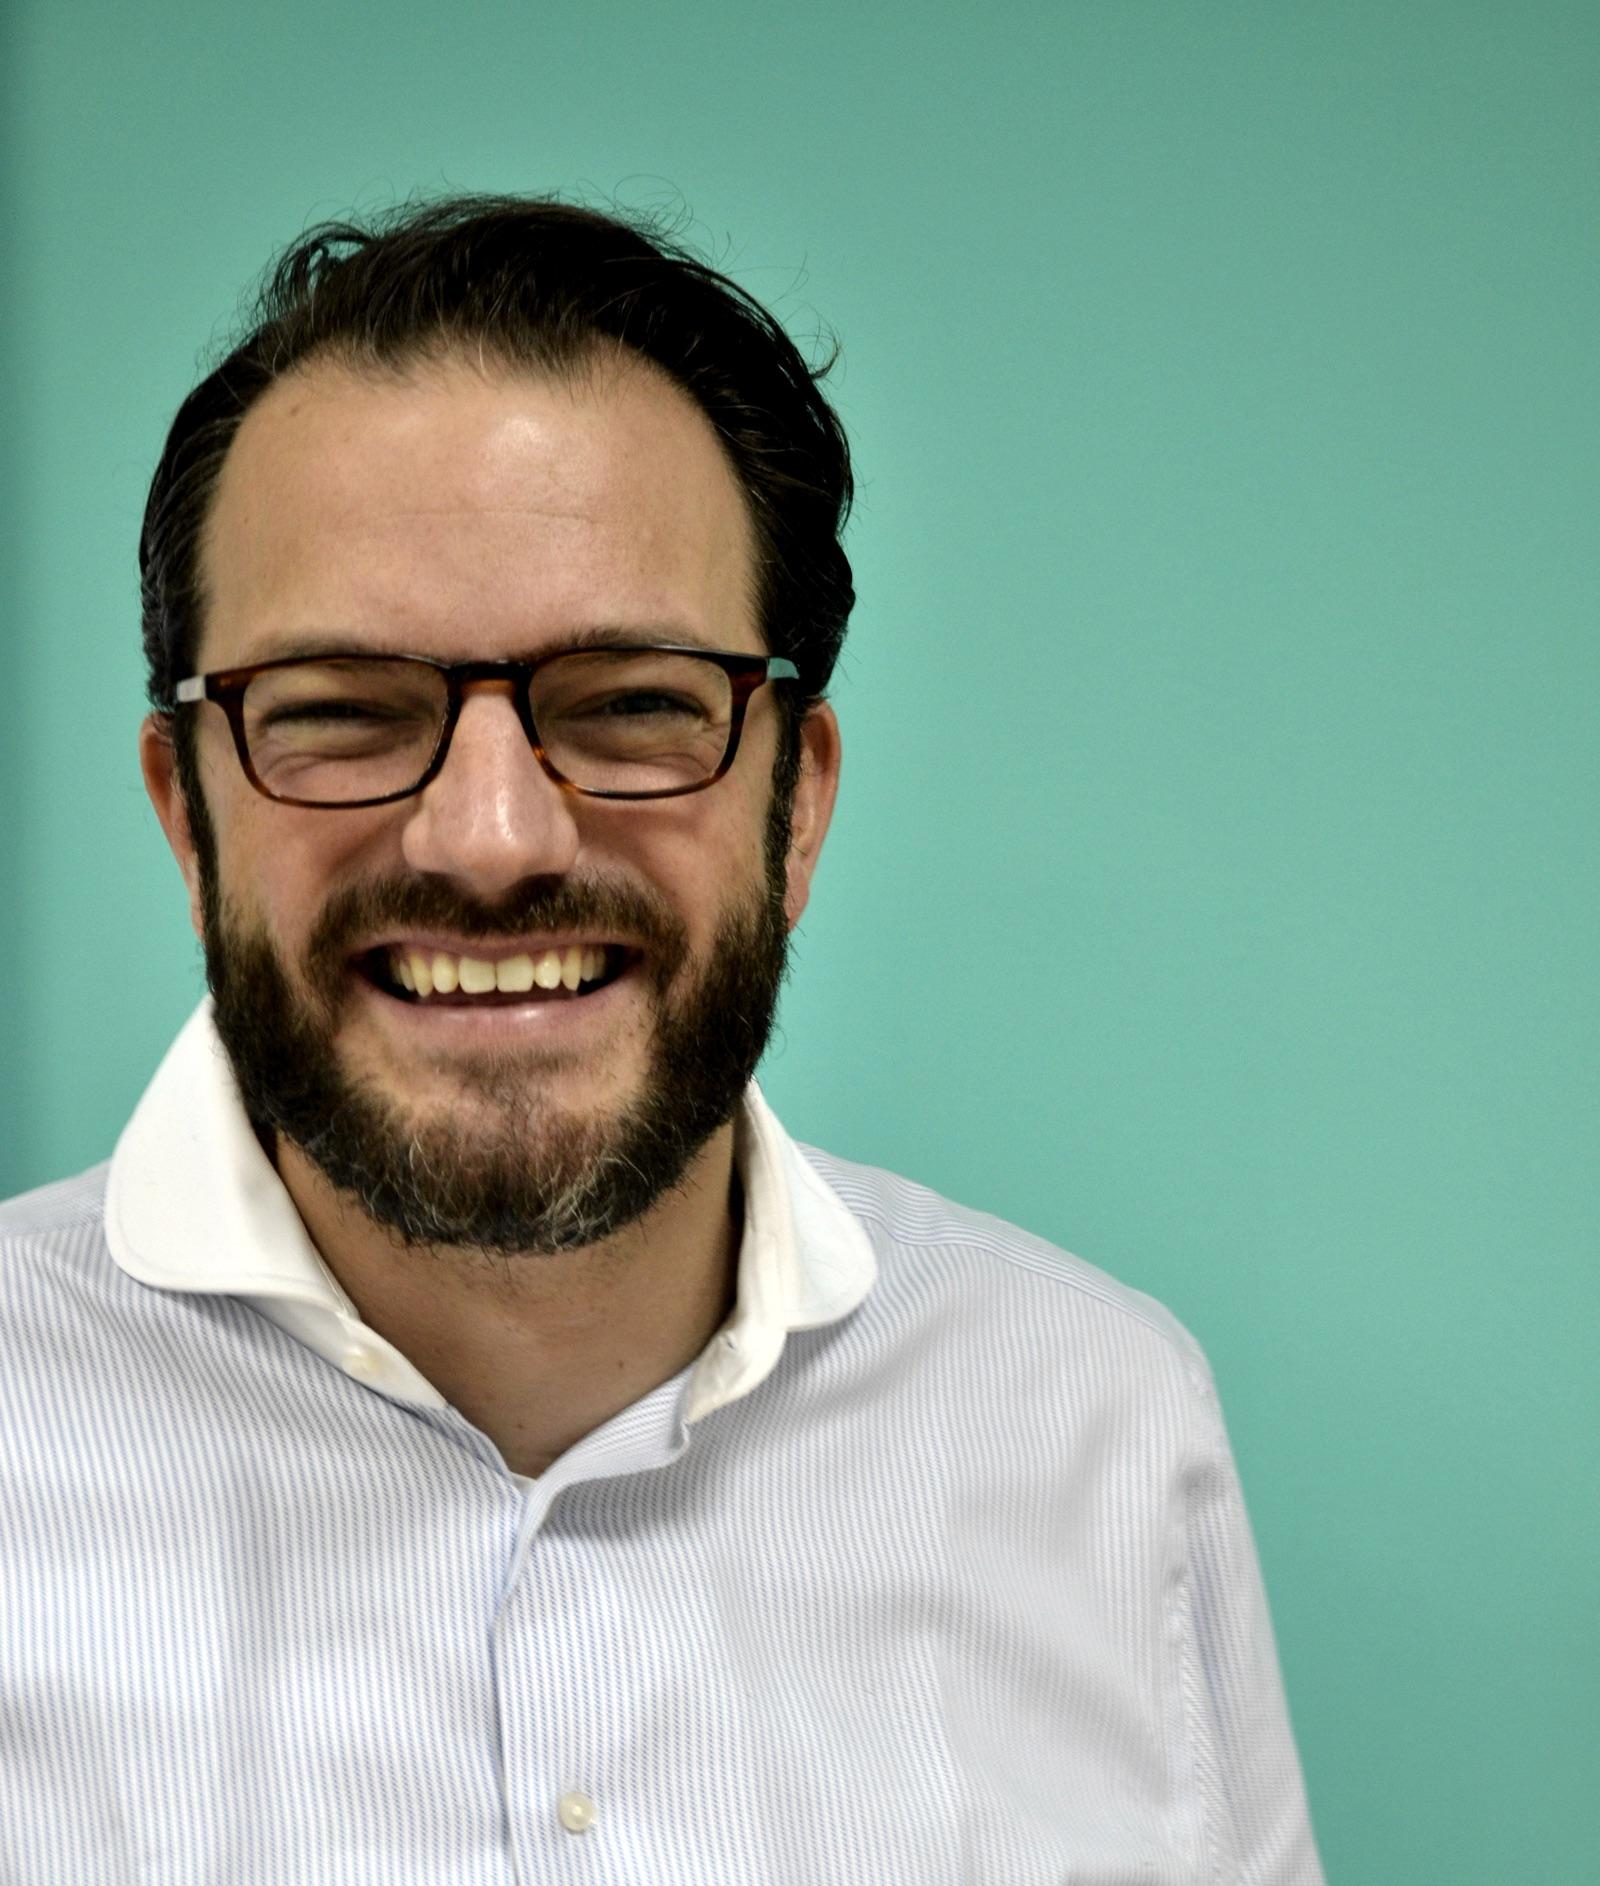 Phil Blumenthal, Director of Freightos Network